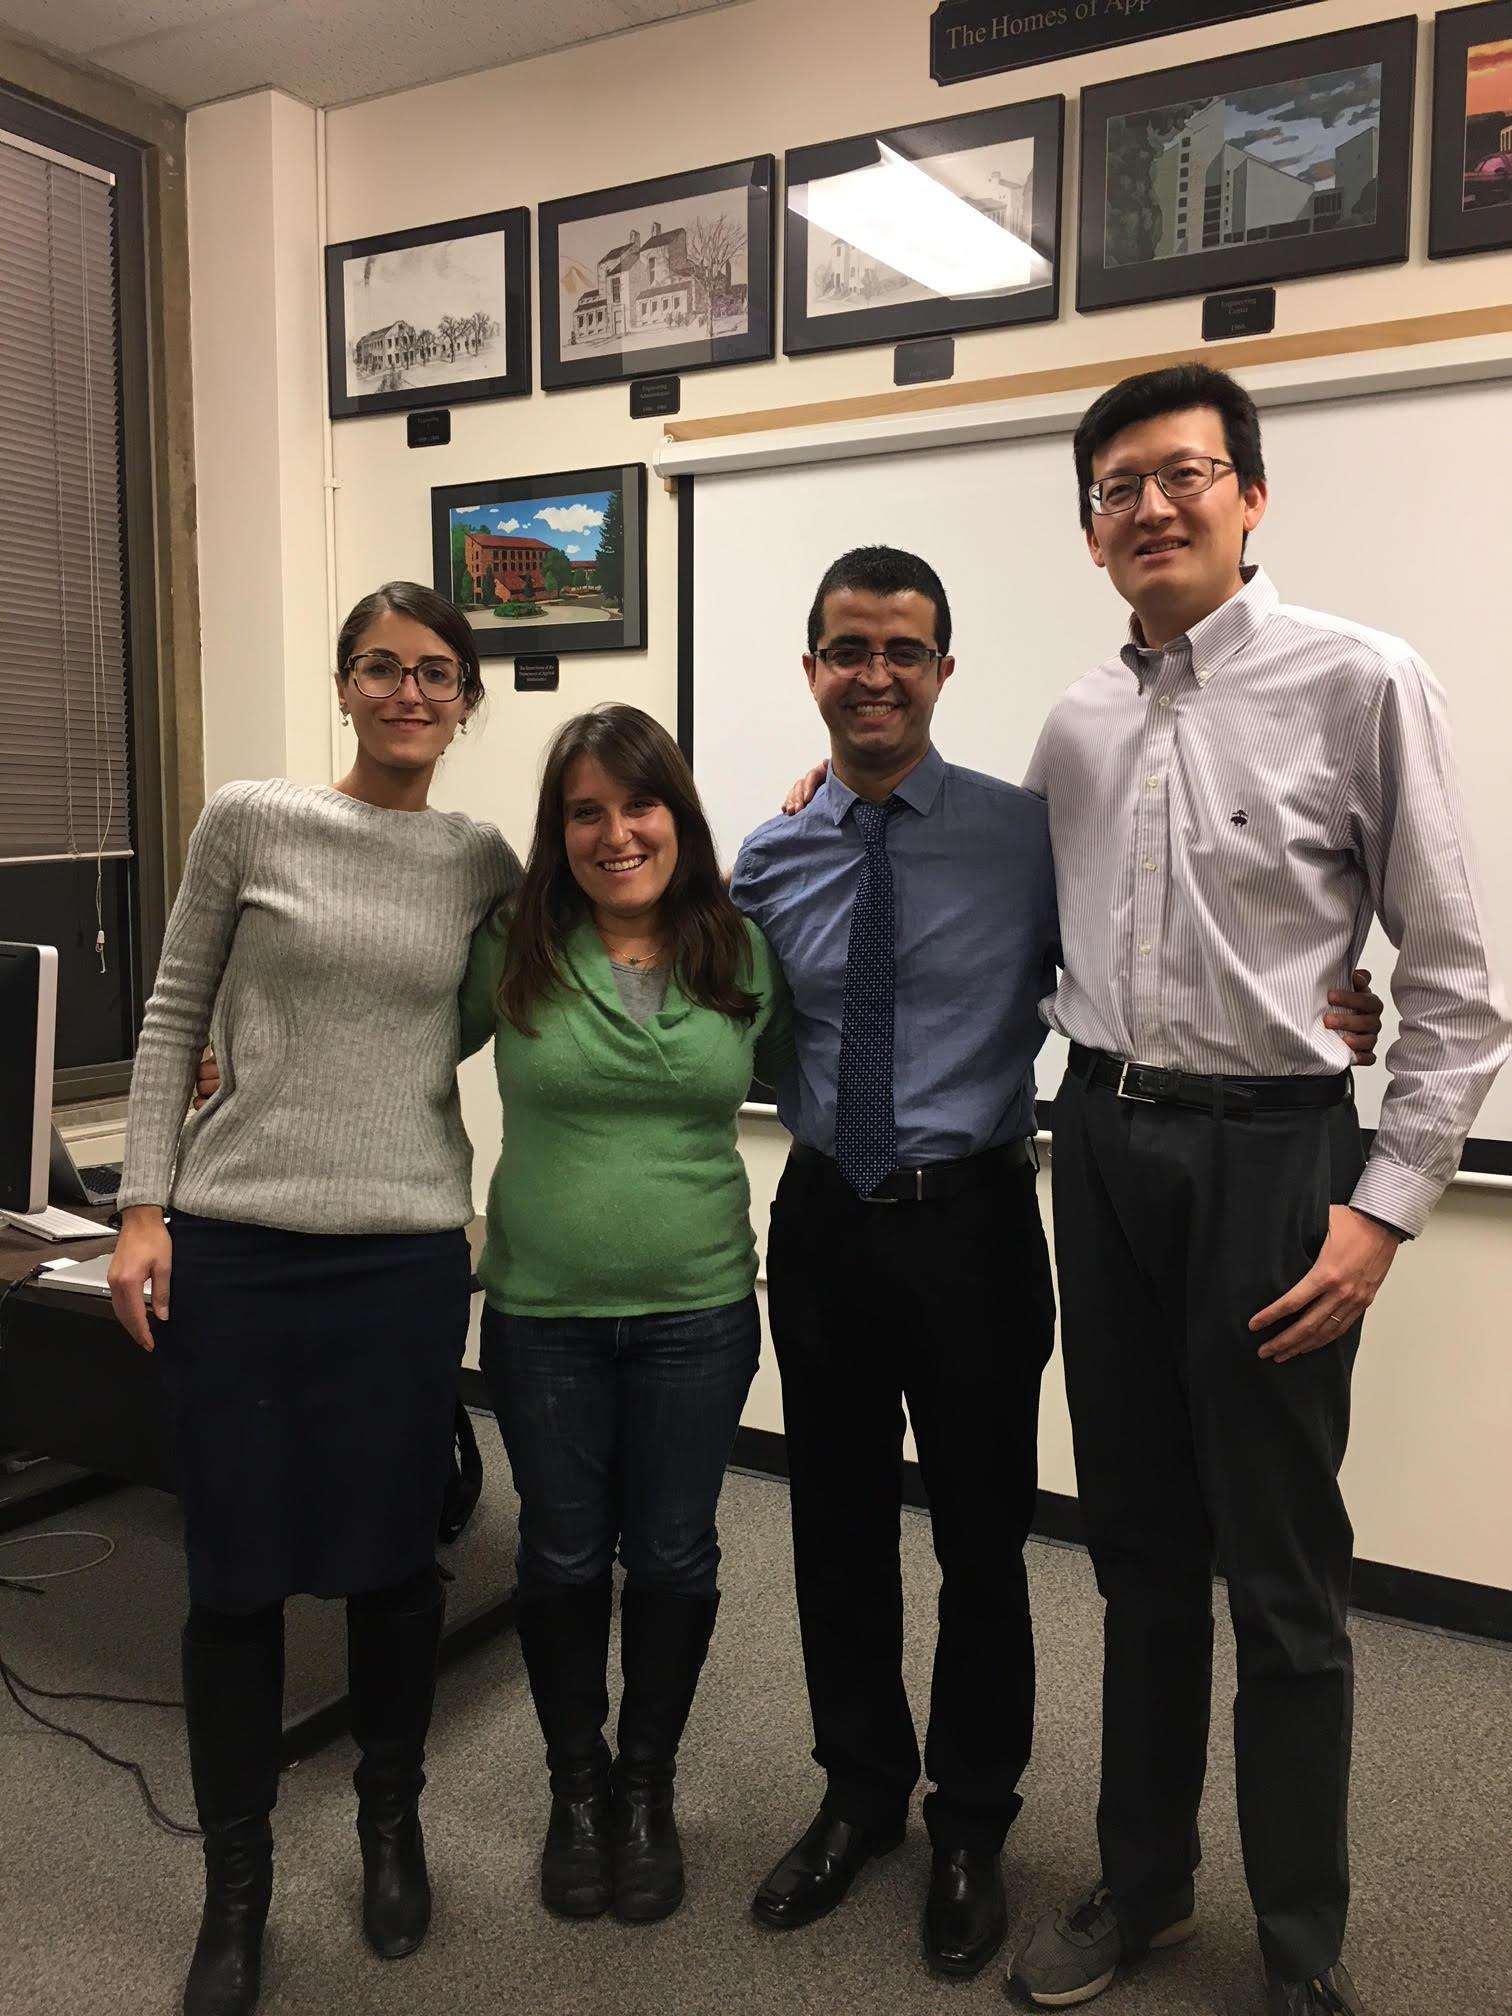 Shideh Dashti, Abbie Liel,  Dr.  Juan Olarte, and Yida Zhang